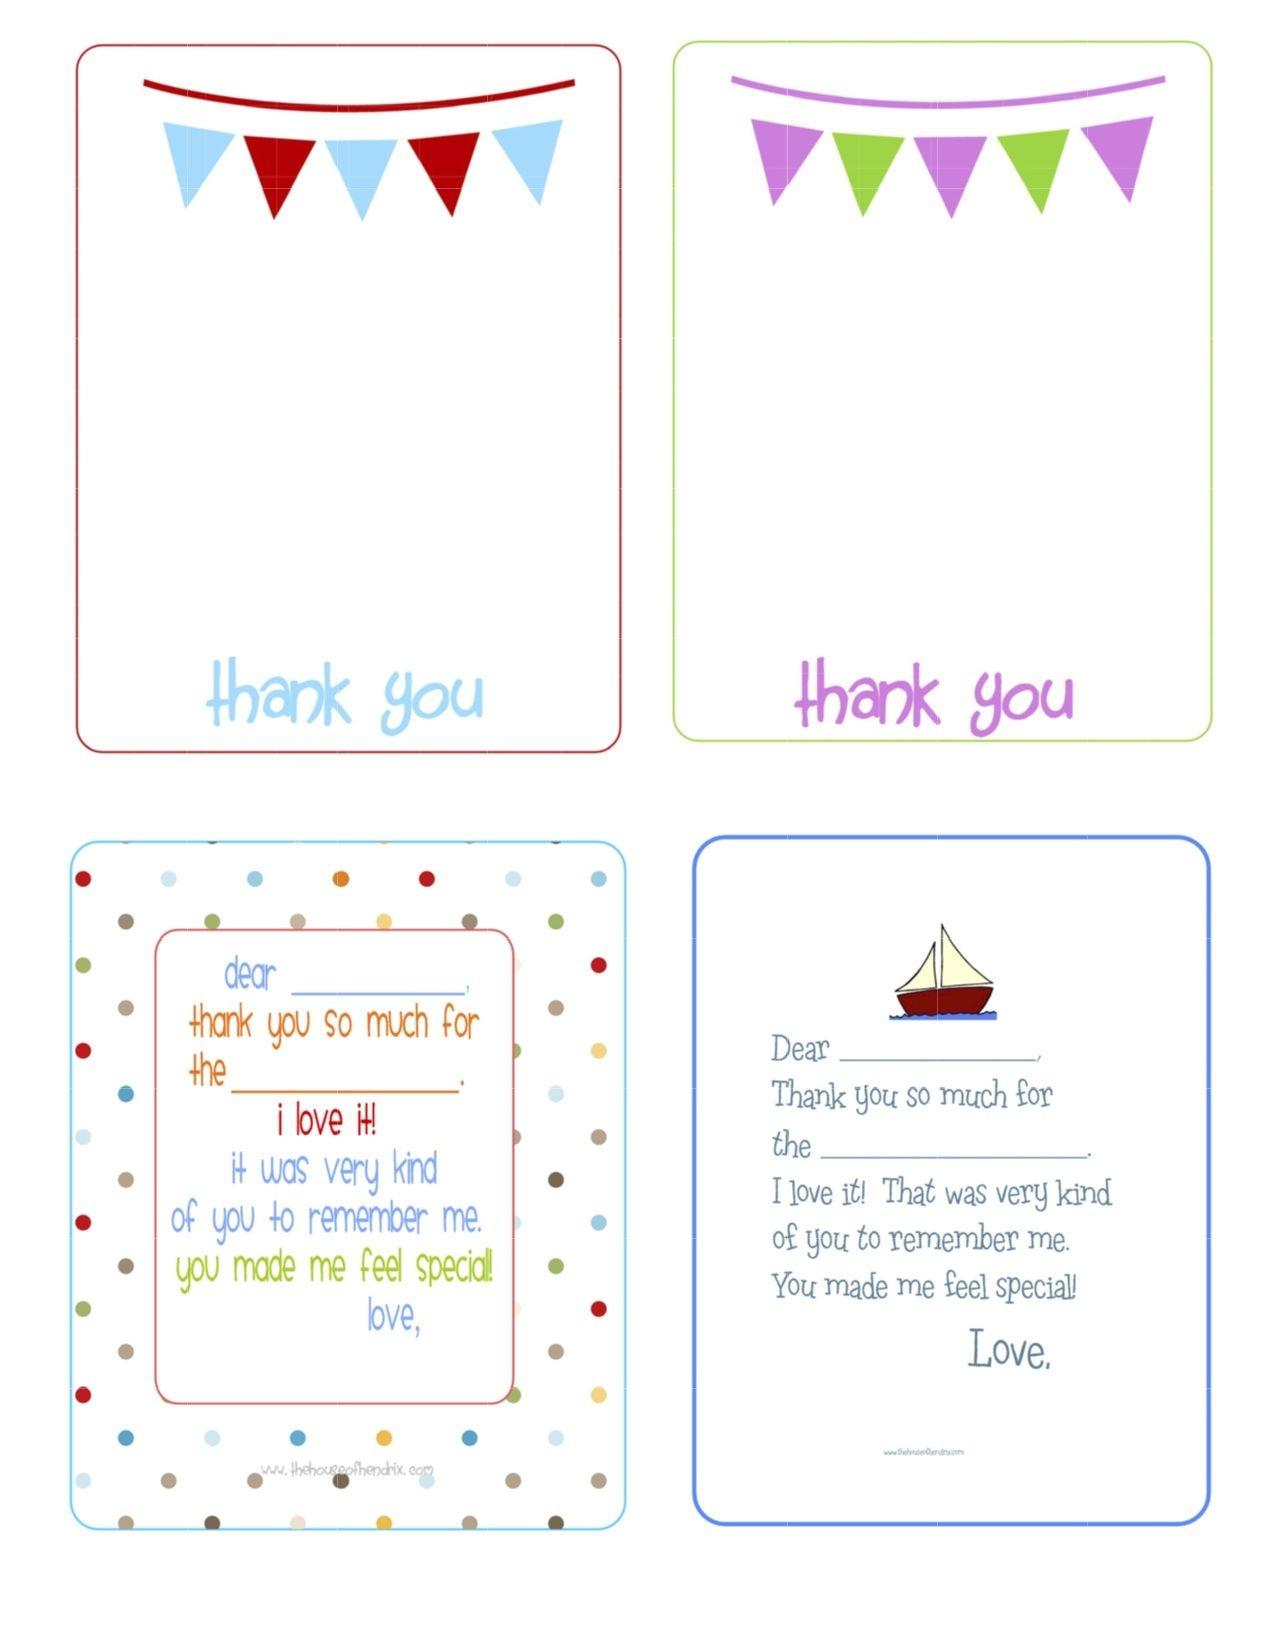 Printable Birthday Thank You Cards - | Printables & Fonts - Free Printable Volunteer Thank You Cards